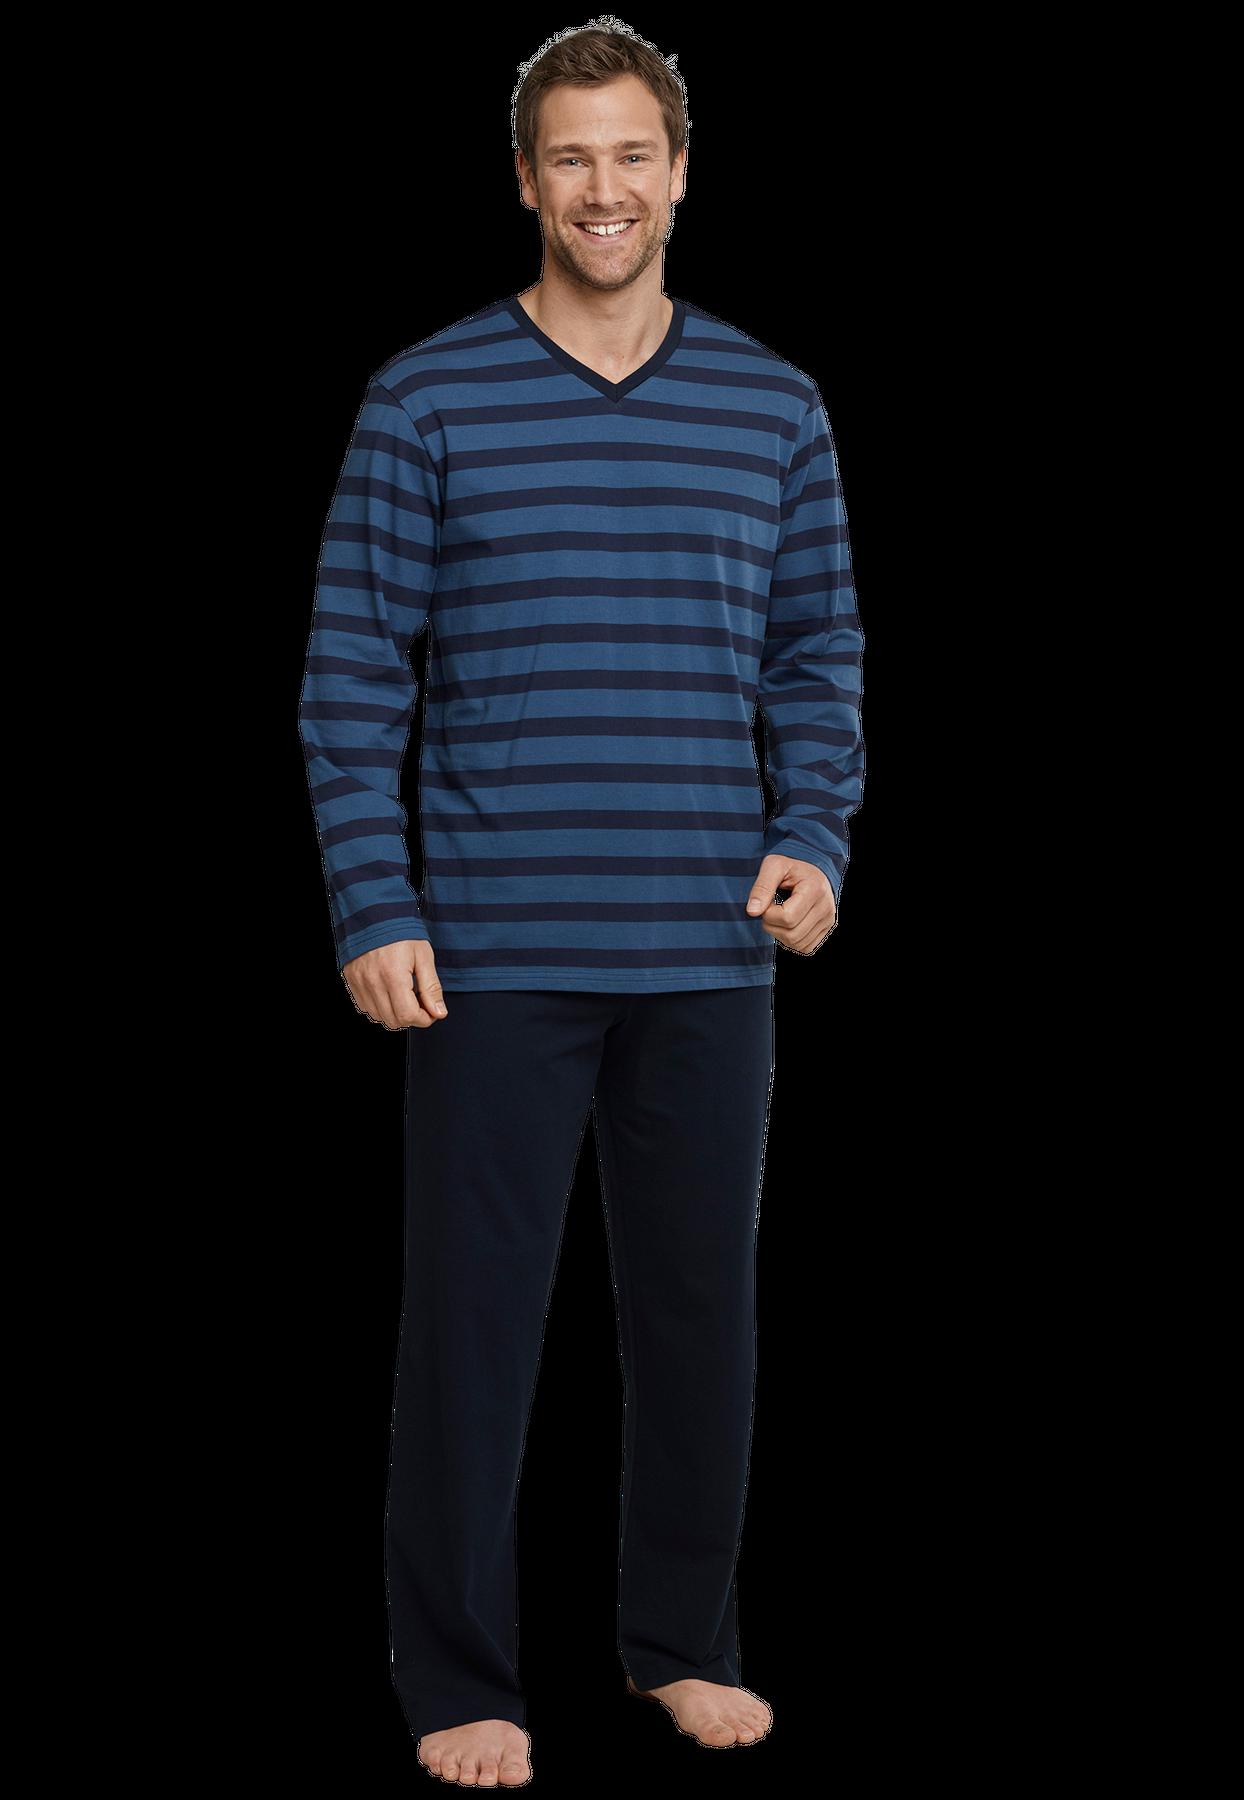 Seidensticker - Herren Pyjama lang, blau (159003) – Bild 1